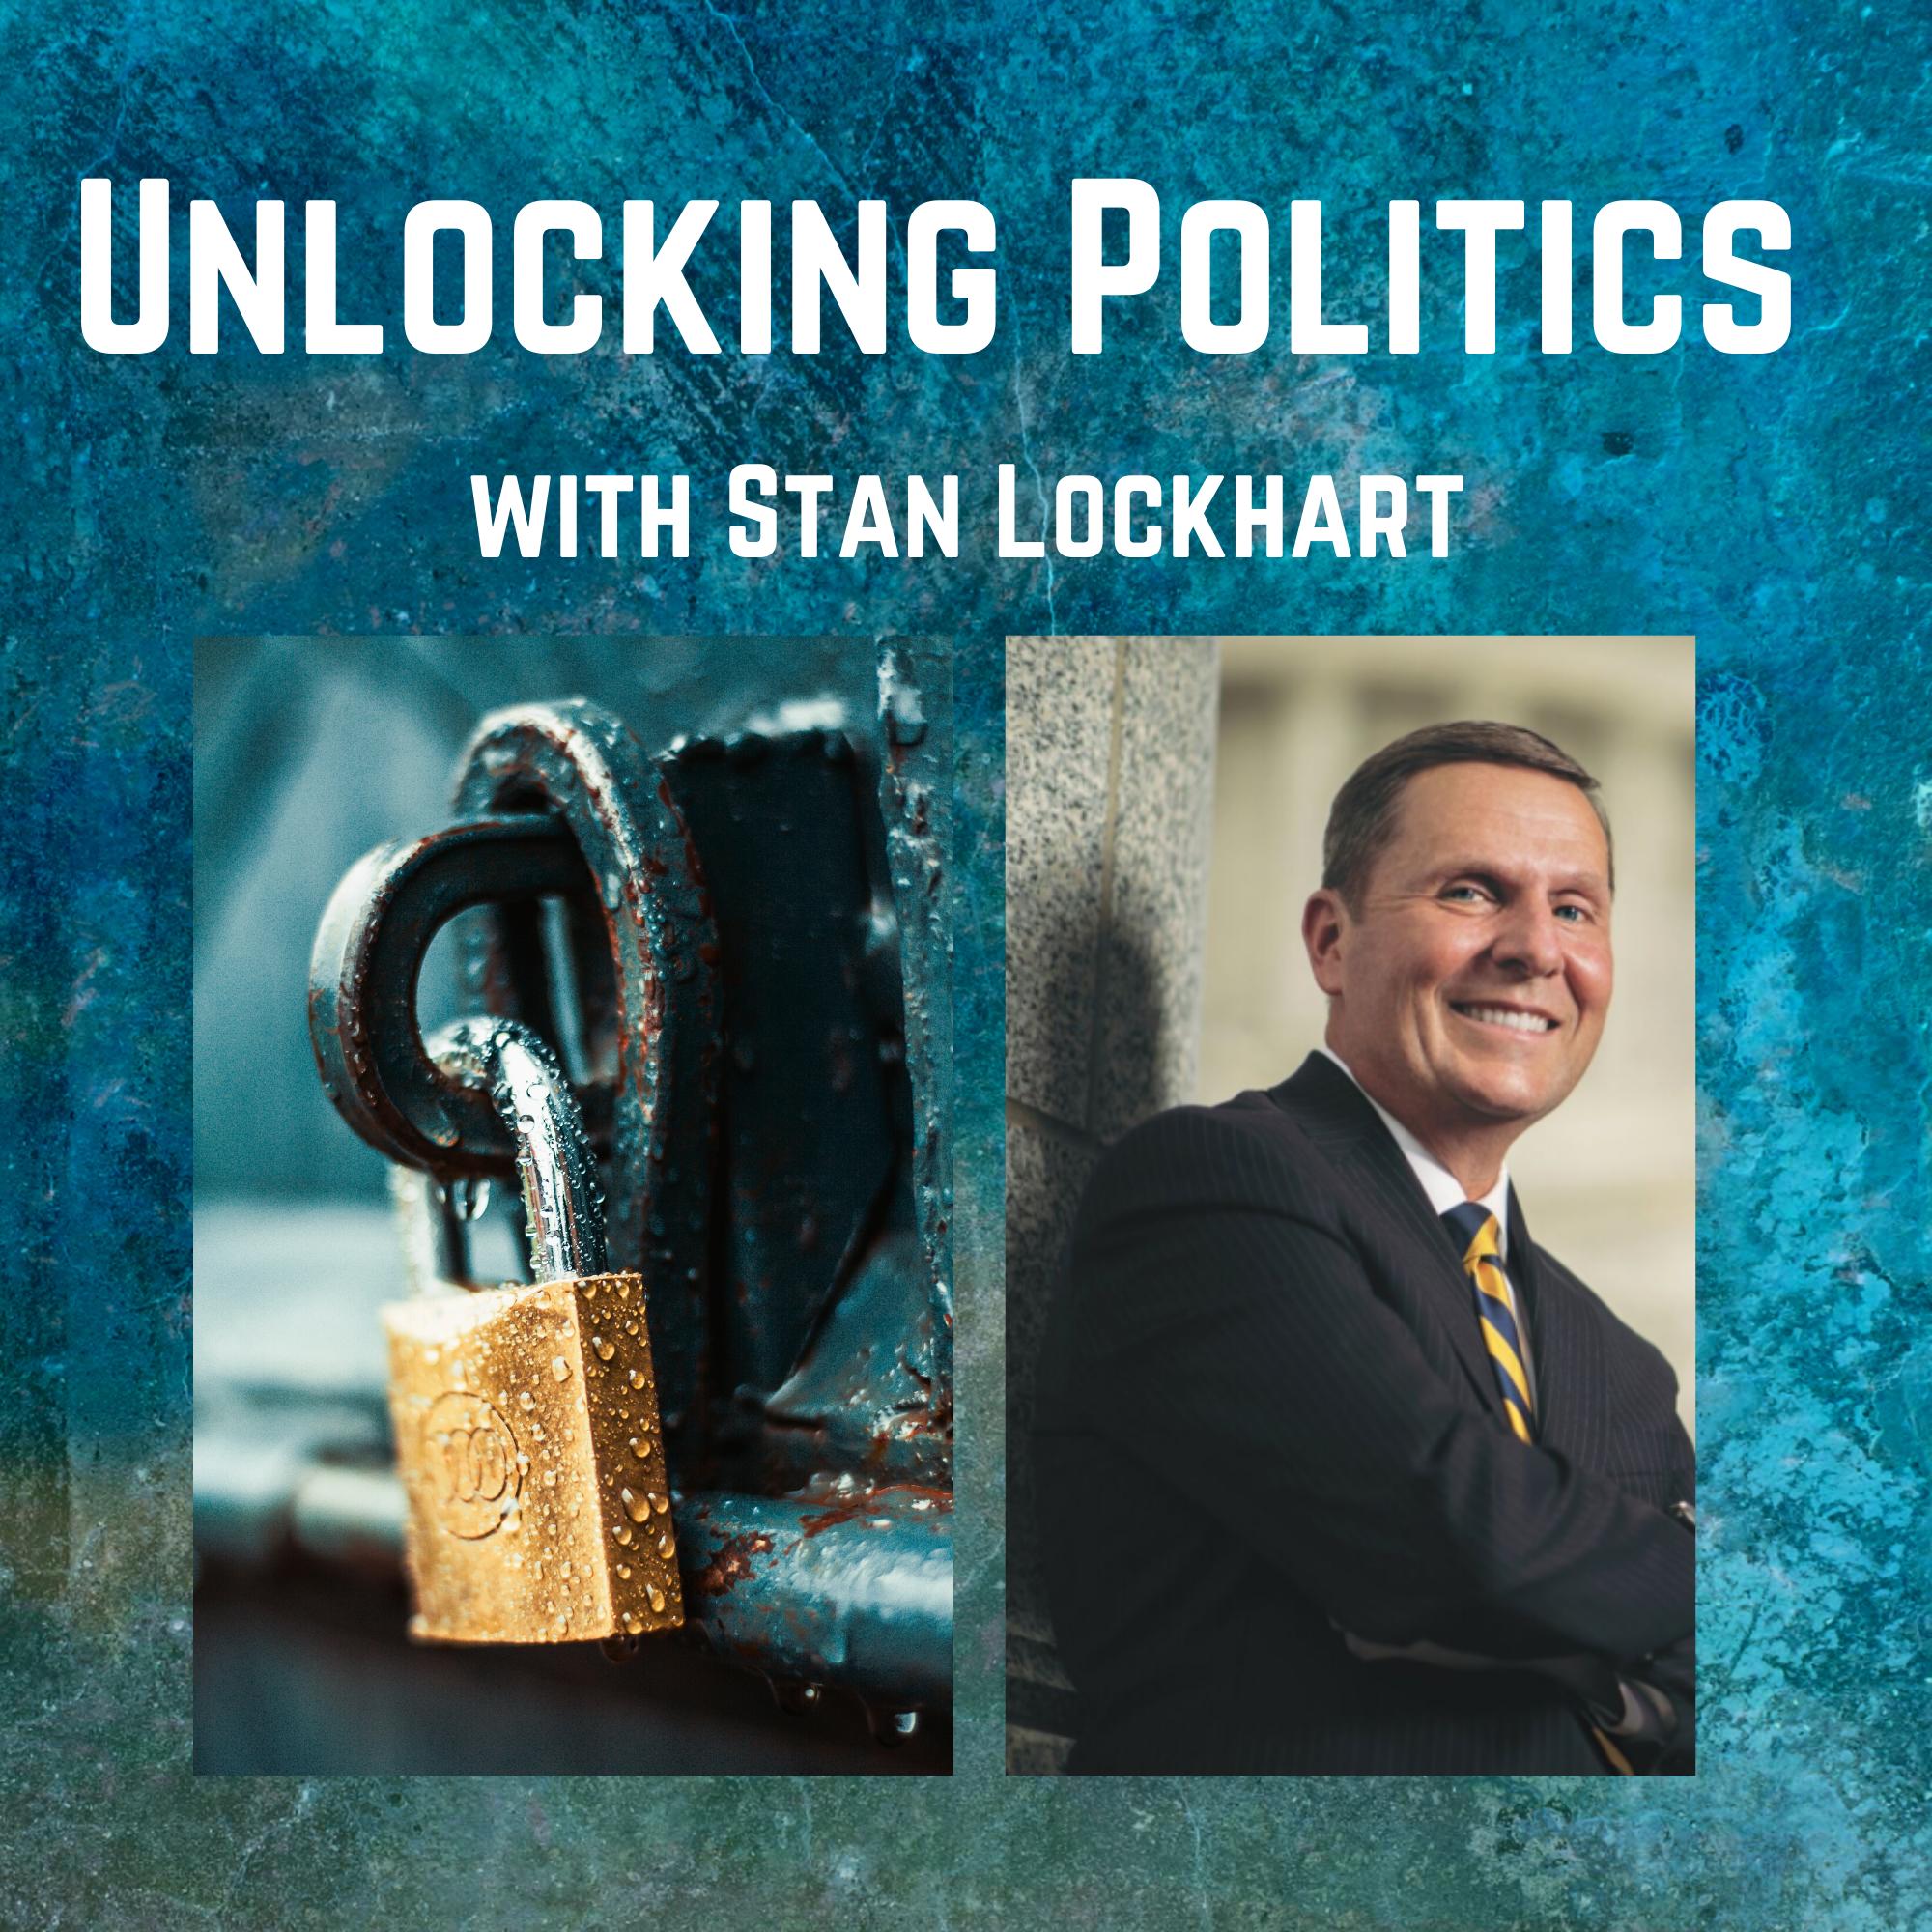 Unlocking Politics with Stan Lockhart show art